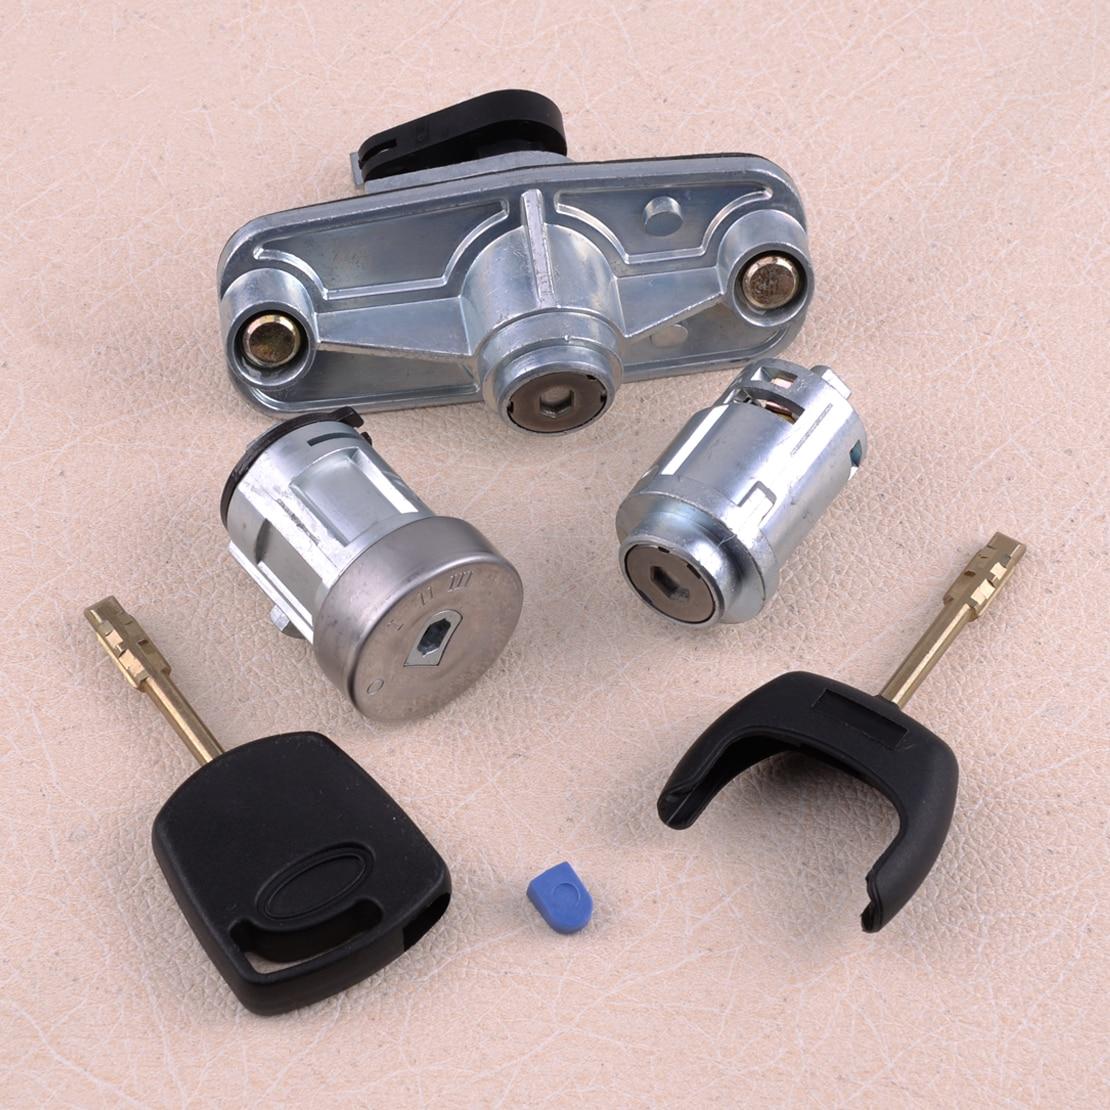 Door Ignition Barrel Petrol Cap & Boot Lock Set Fit For Ford Mondeo MK3 2000 2001 2002 2003 2004 2005 2006 2007